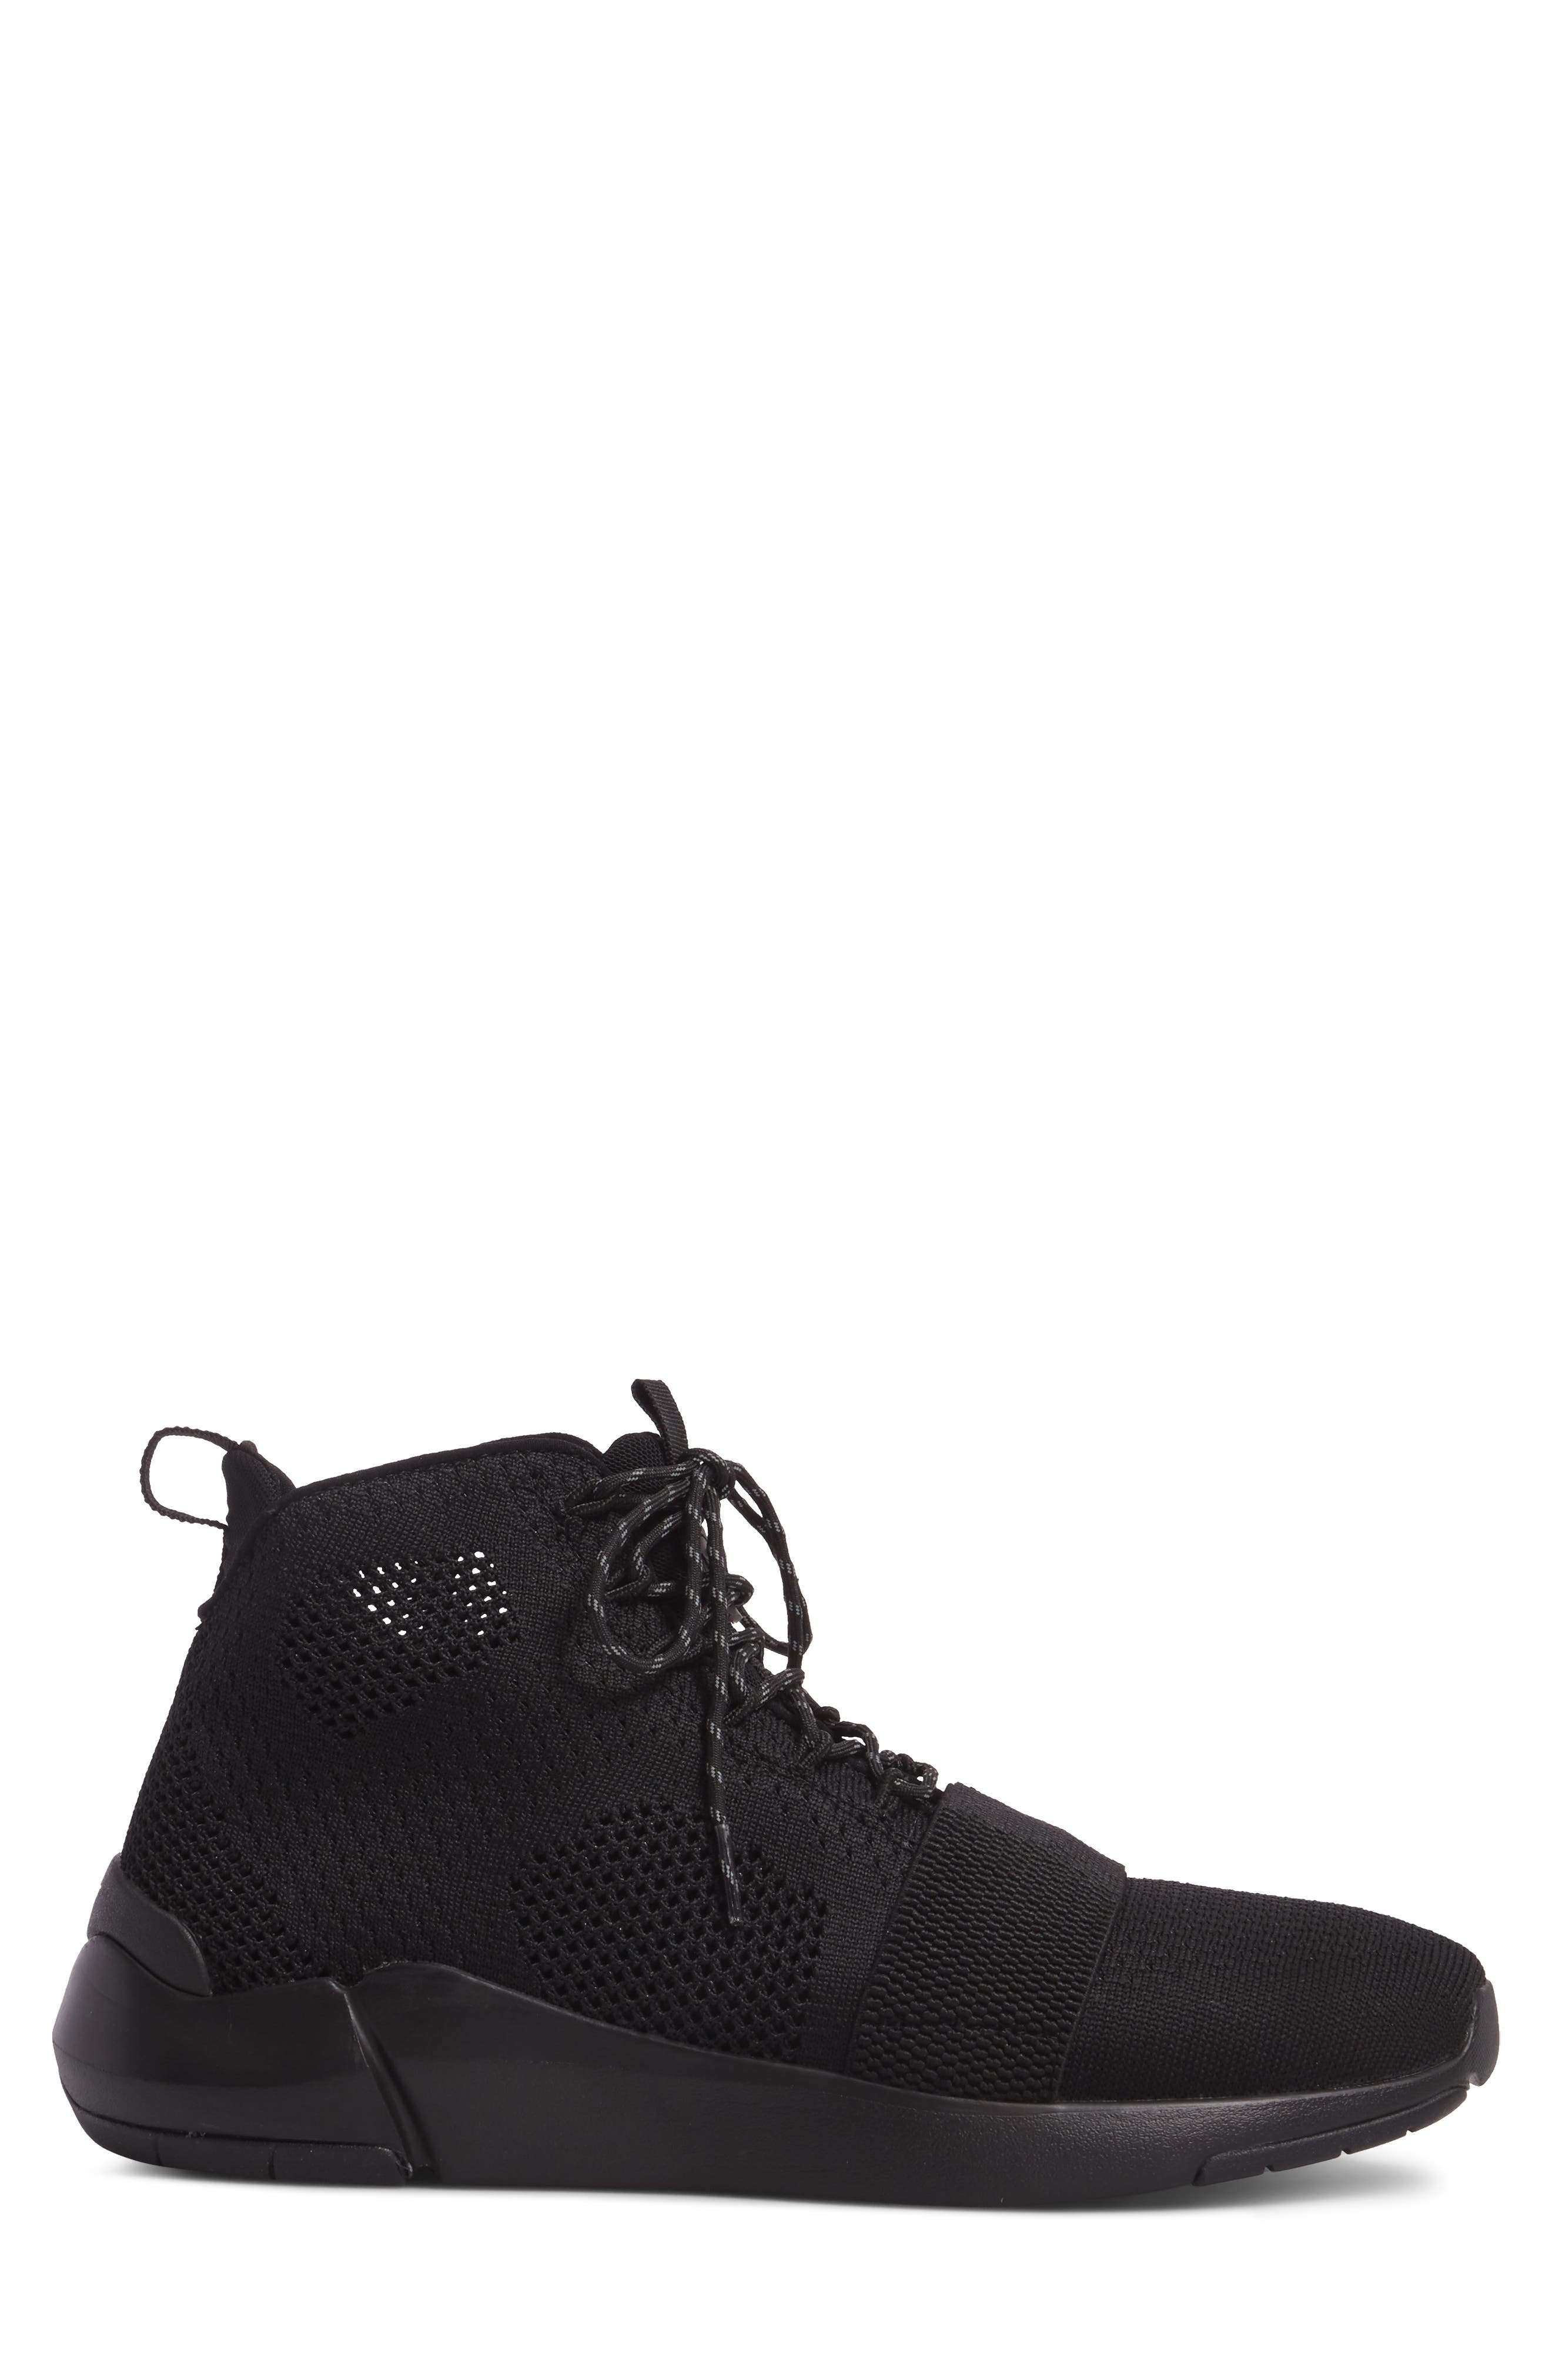 Modica Sneaker,                             Alternate thumbnail 3, color,                             012